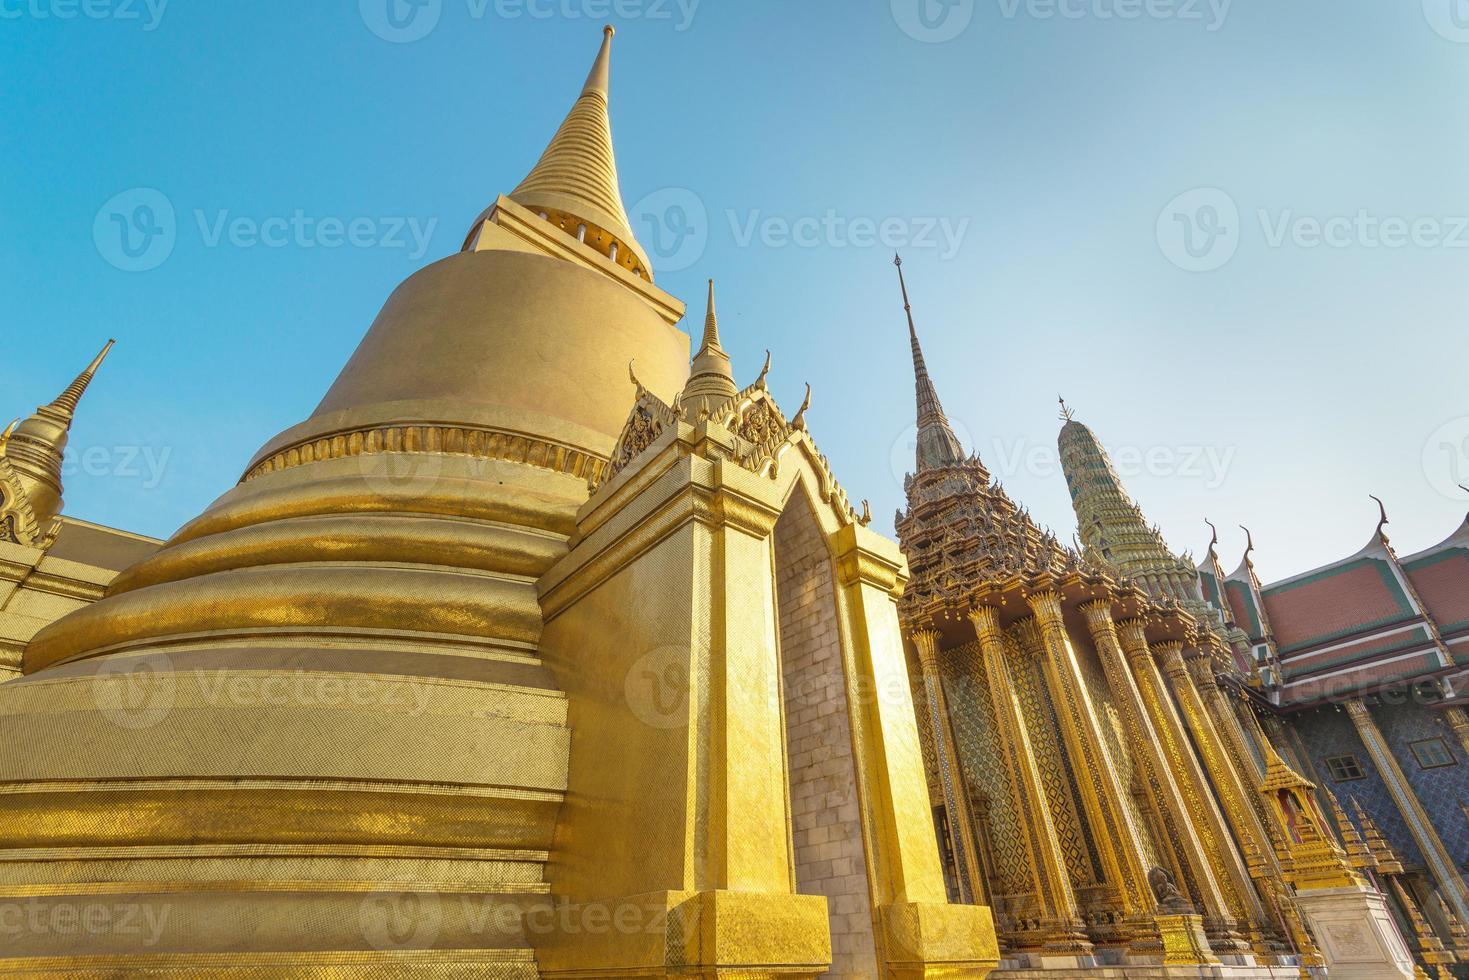 bij phra kaeo, tempel van de smaragdgroene Boeddha, bangkok thailand. foto